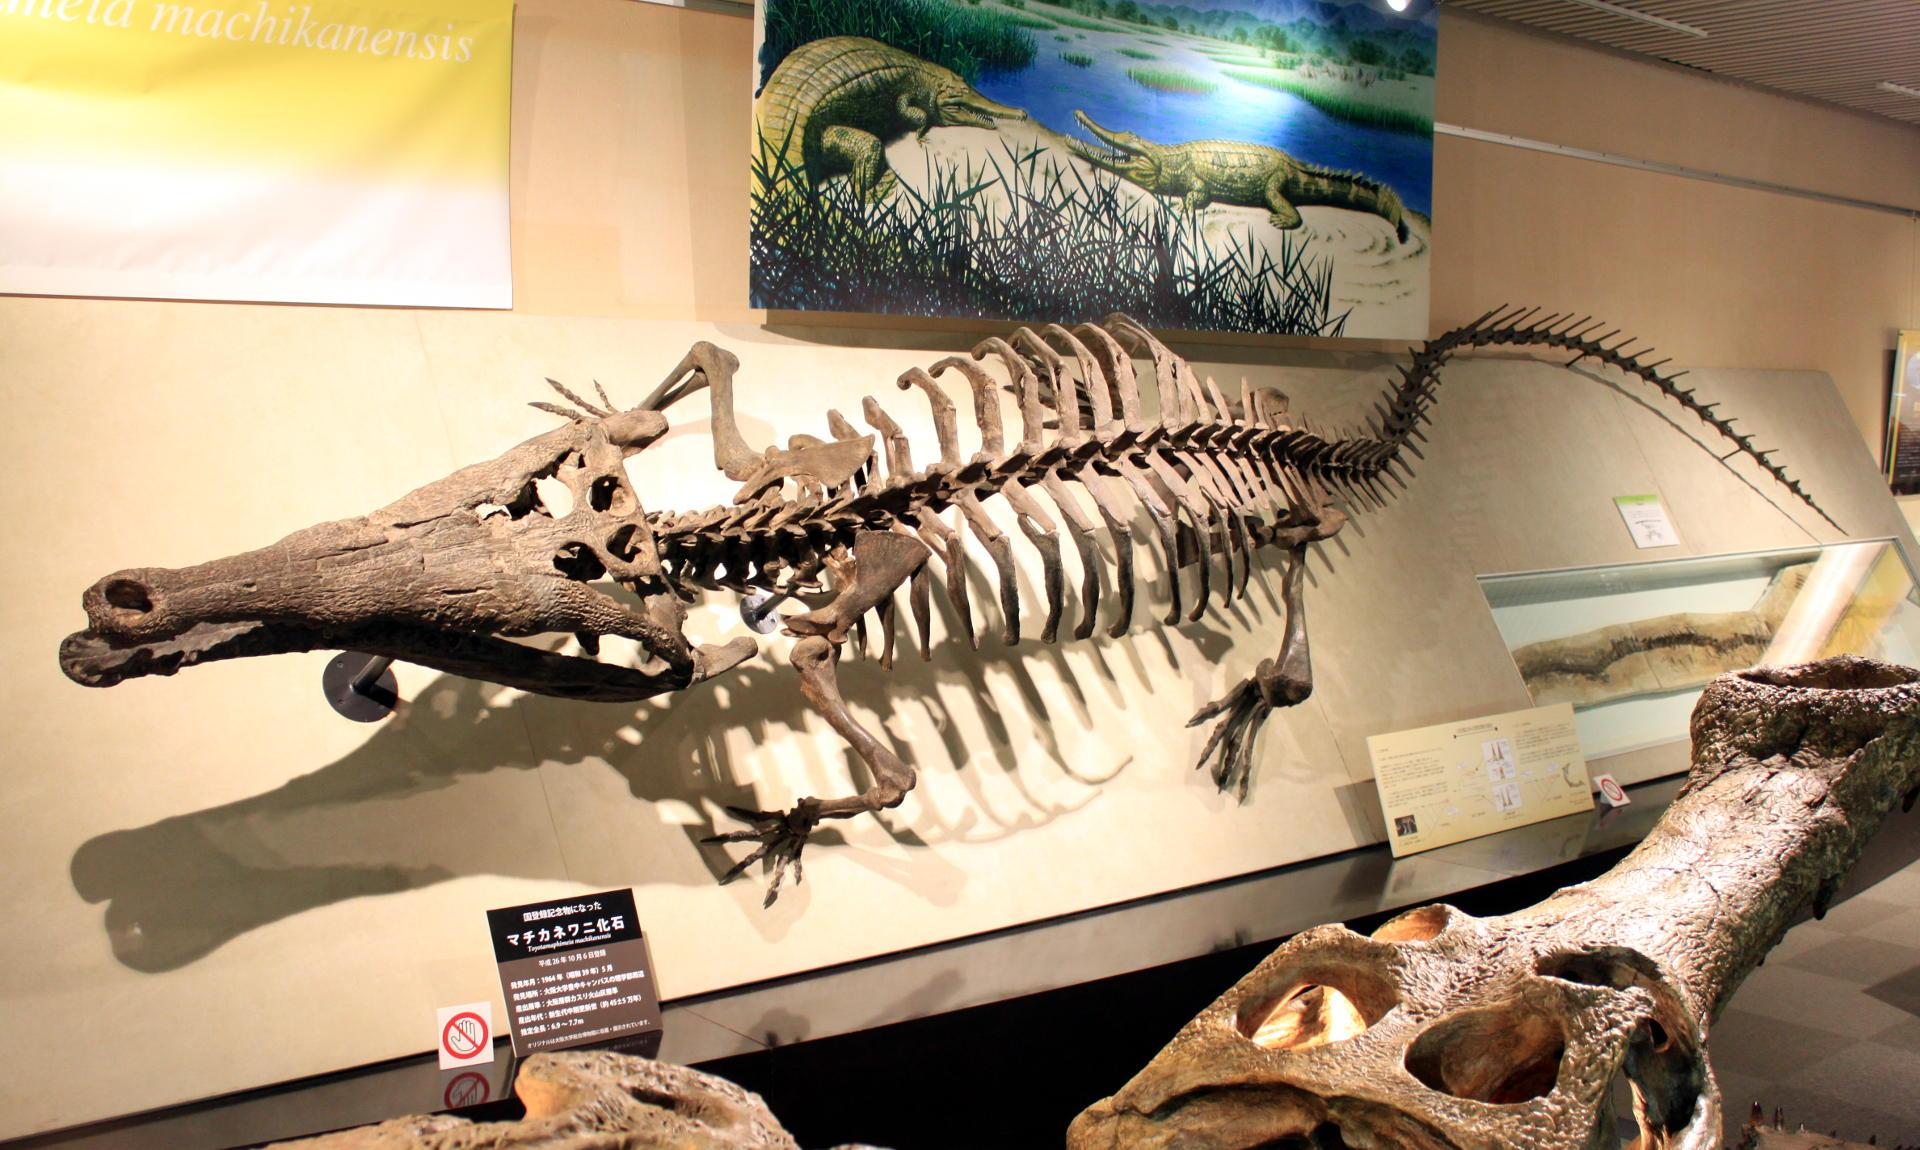 japonia sapporo muzeum hokkaidomuzeumuniwersyteckie hokkaidouniversitymuseum historiahokkaido muzeumhokkaido muzeumsapporo szkielet aligator iglawpodrozy